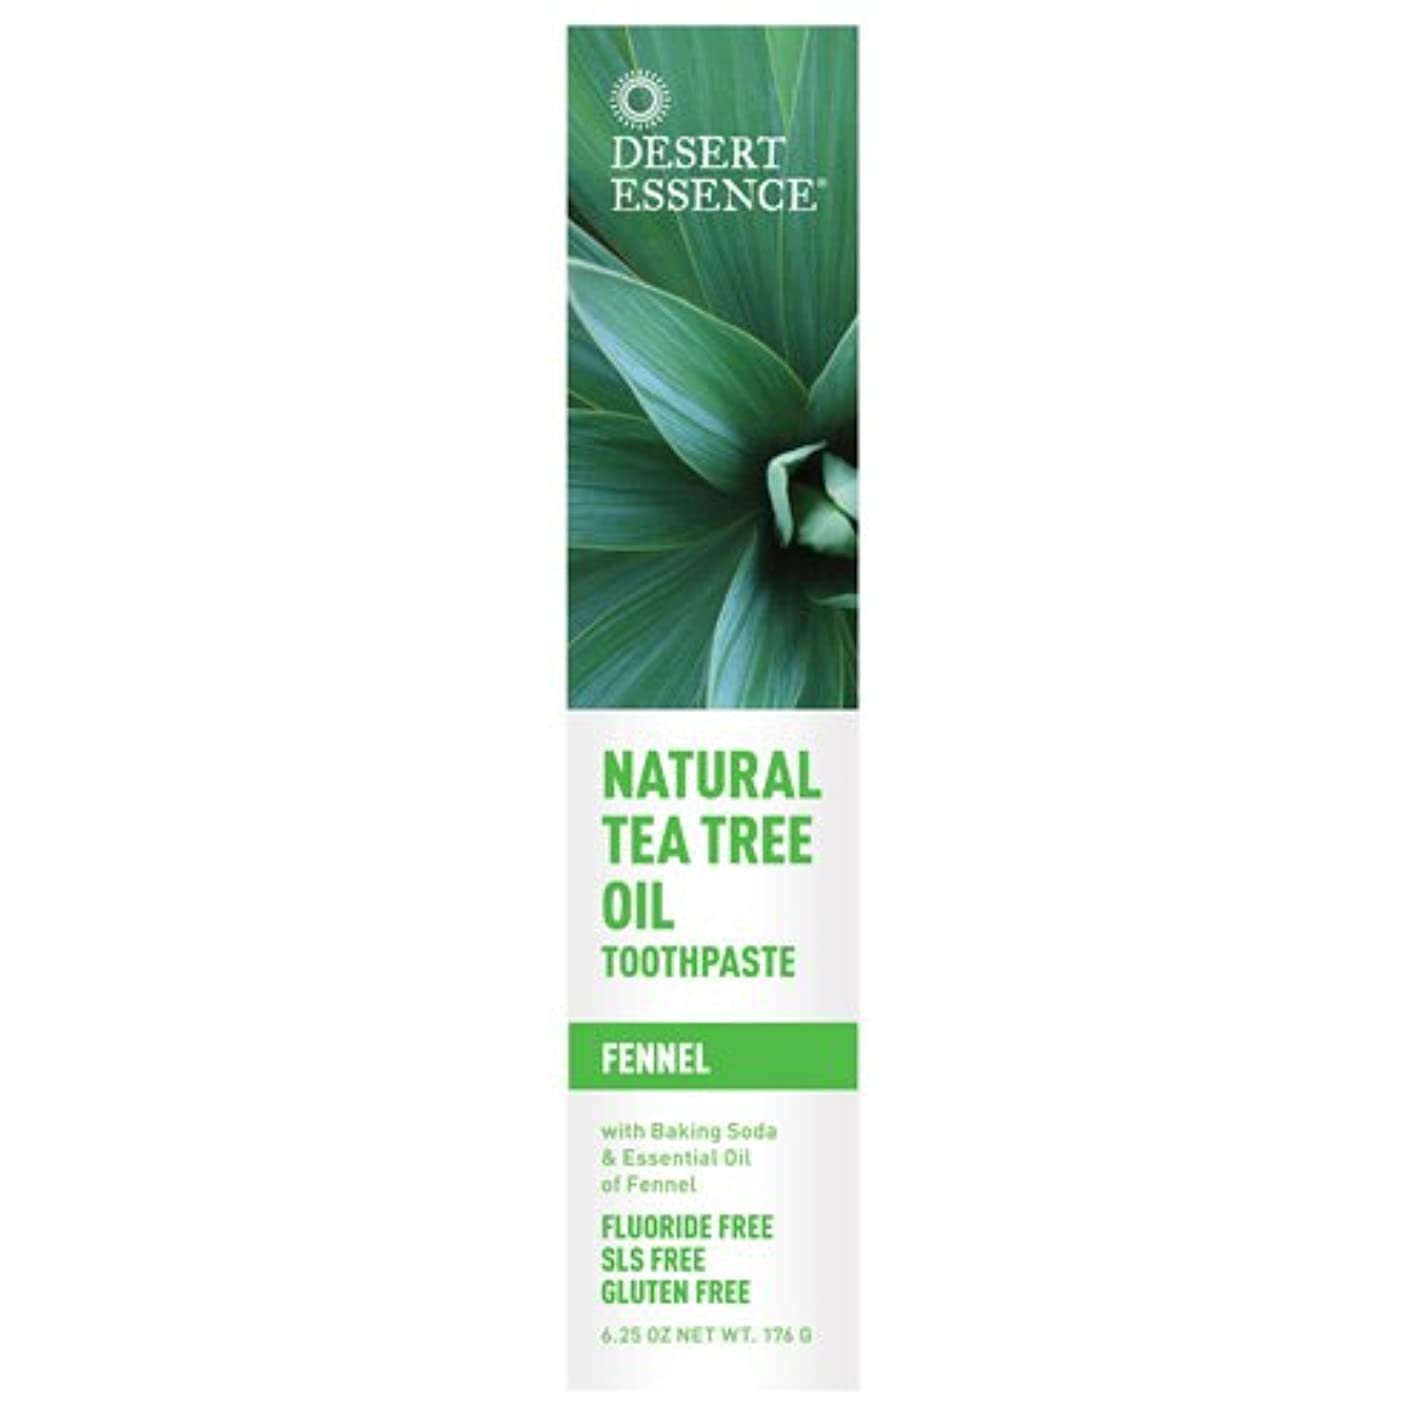 発行沼地インレイ海外直送品 Desert Essence Toothpaste Tea Tree, 7oz